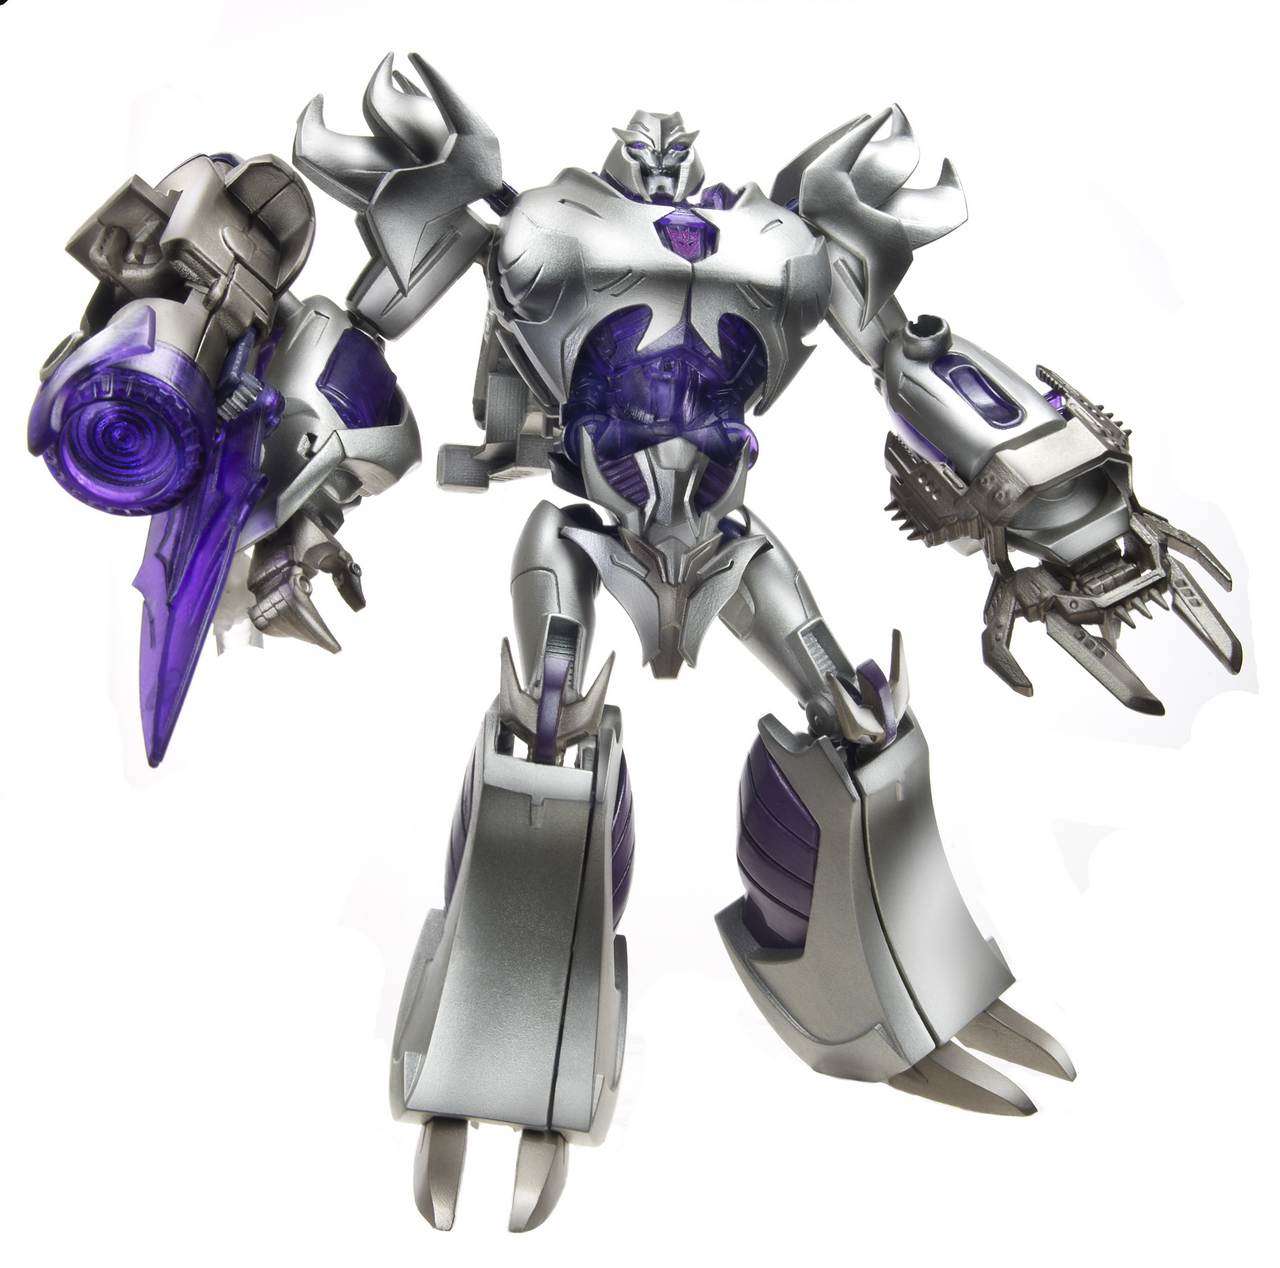 Megatron transformers toys tfw2005 - Transformers prime megatron ...